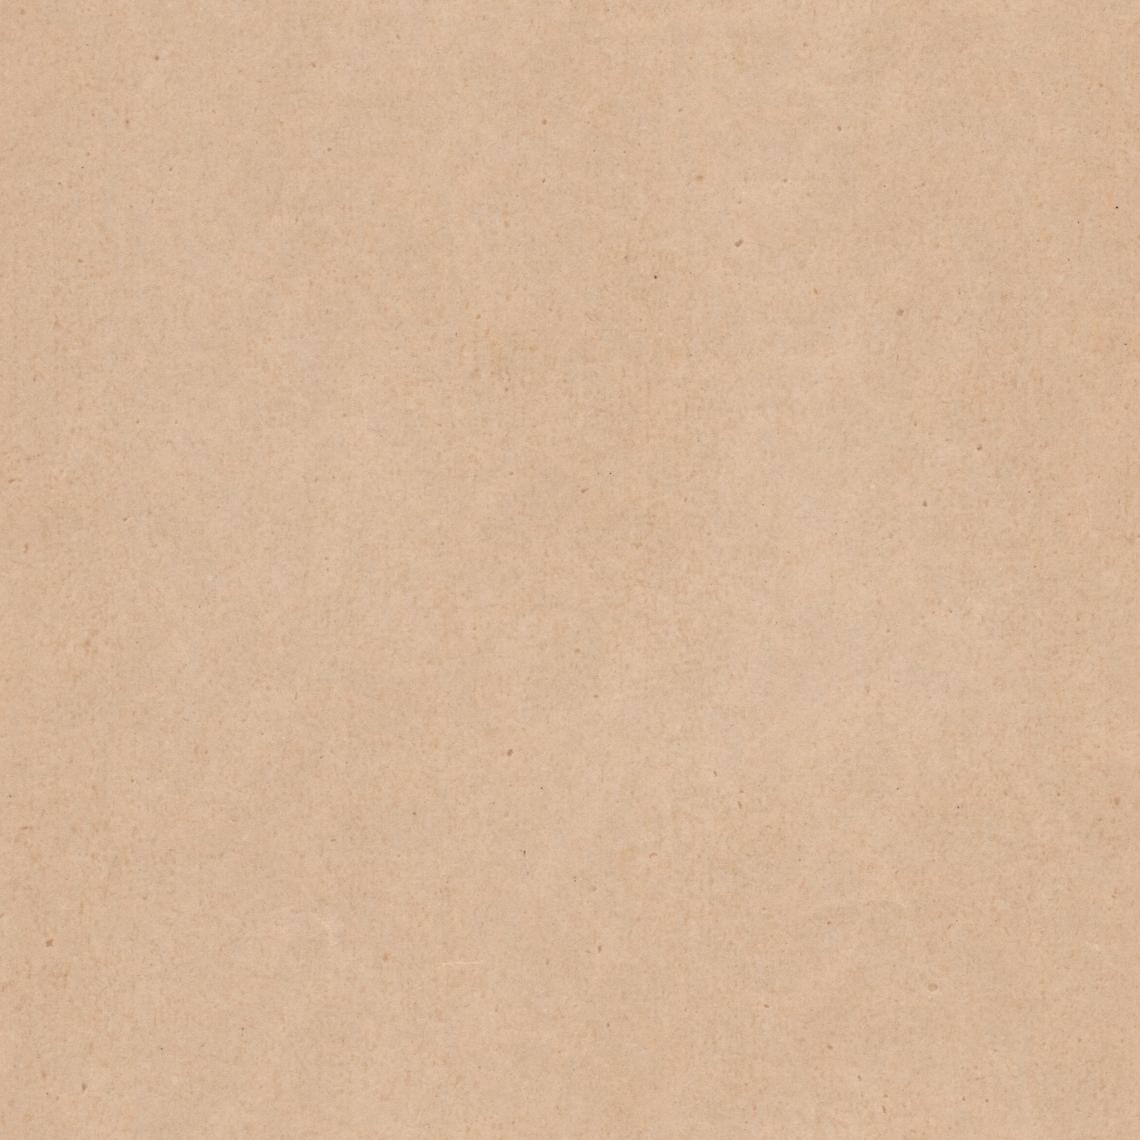 Seamless Paper 0006